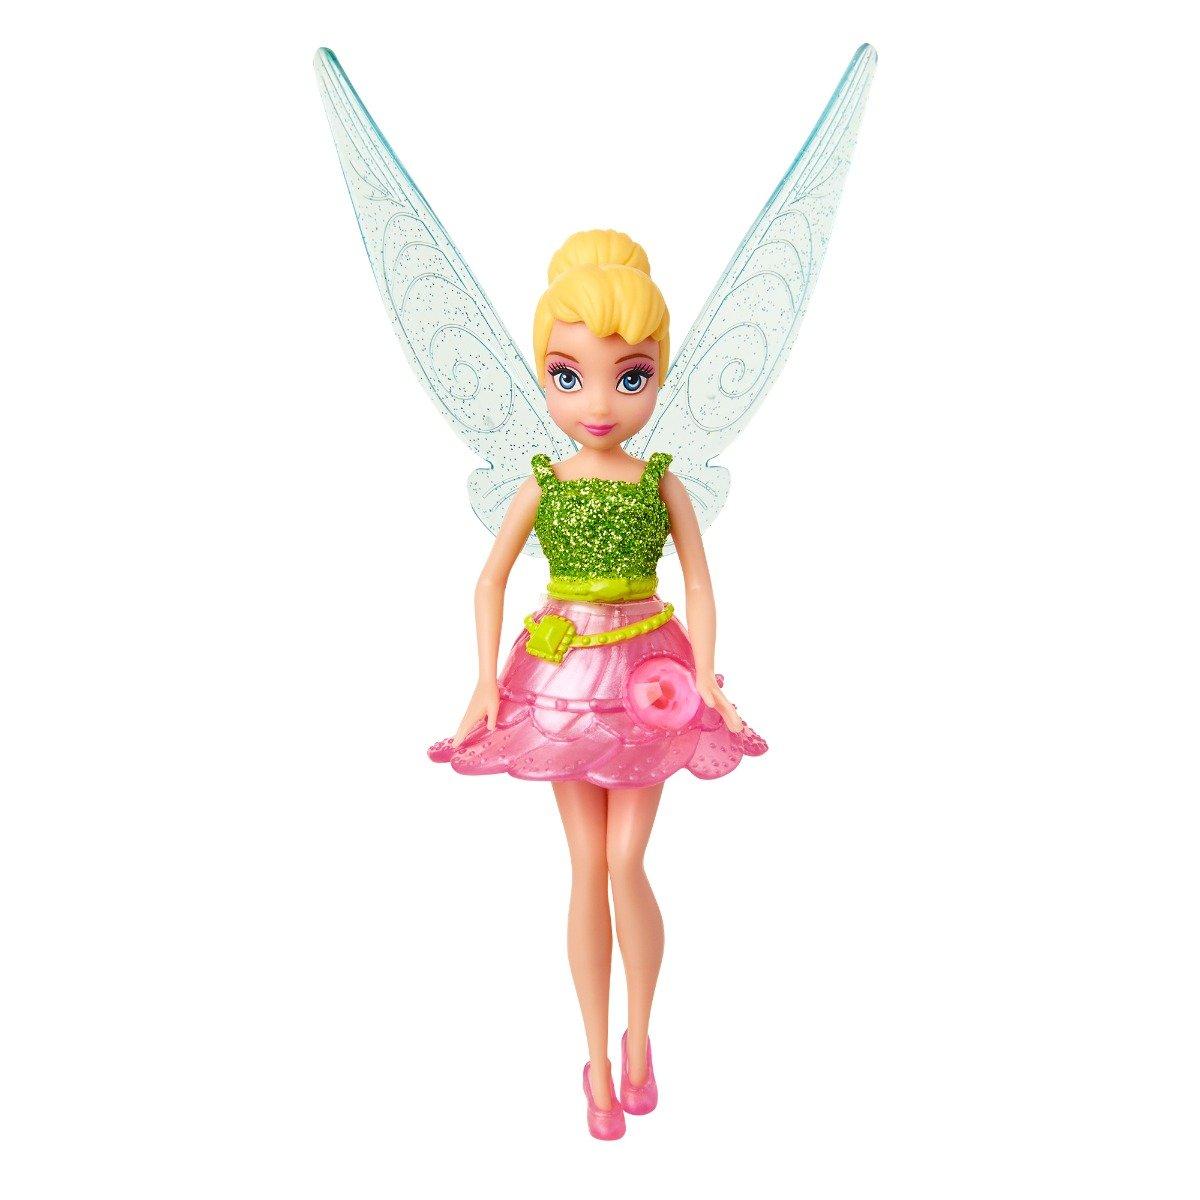 Papusa Disney Fairies, Tinker Bell, Roz, 12 cm